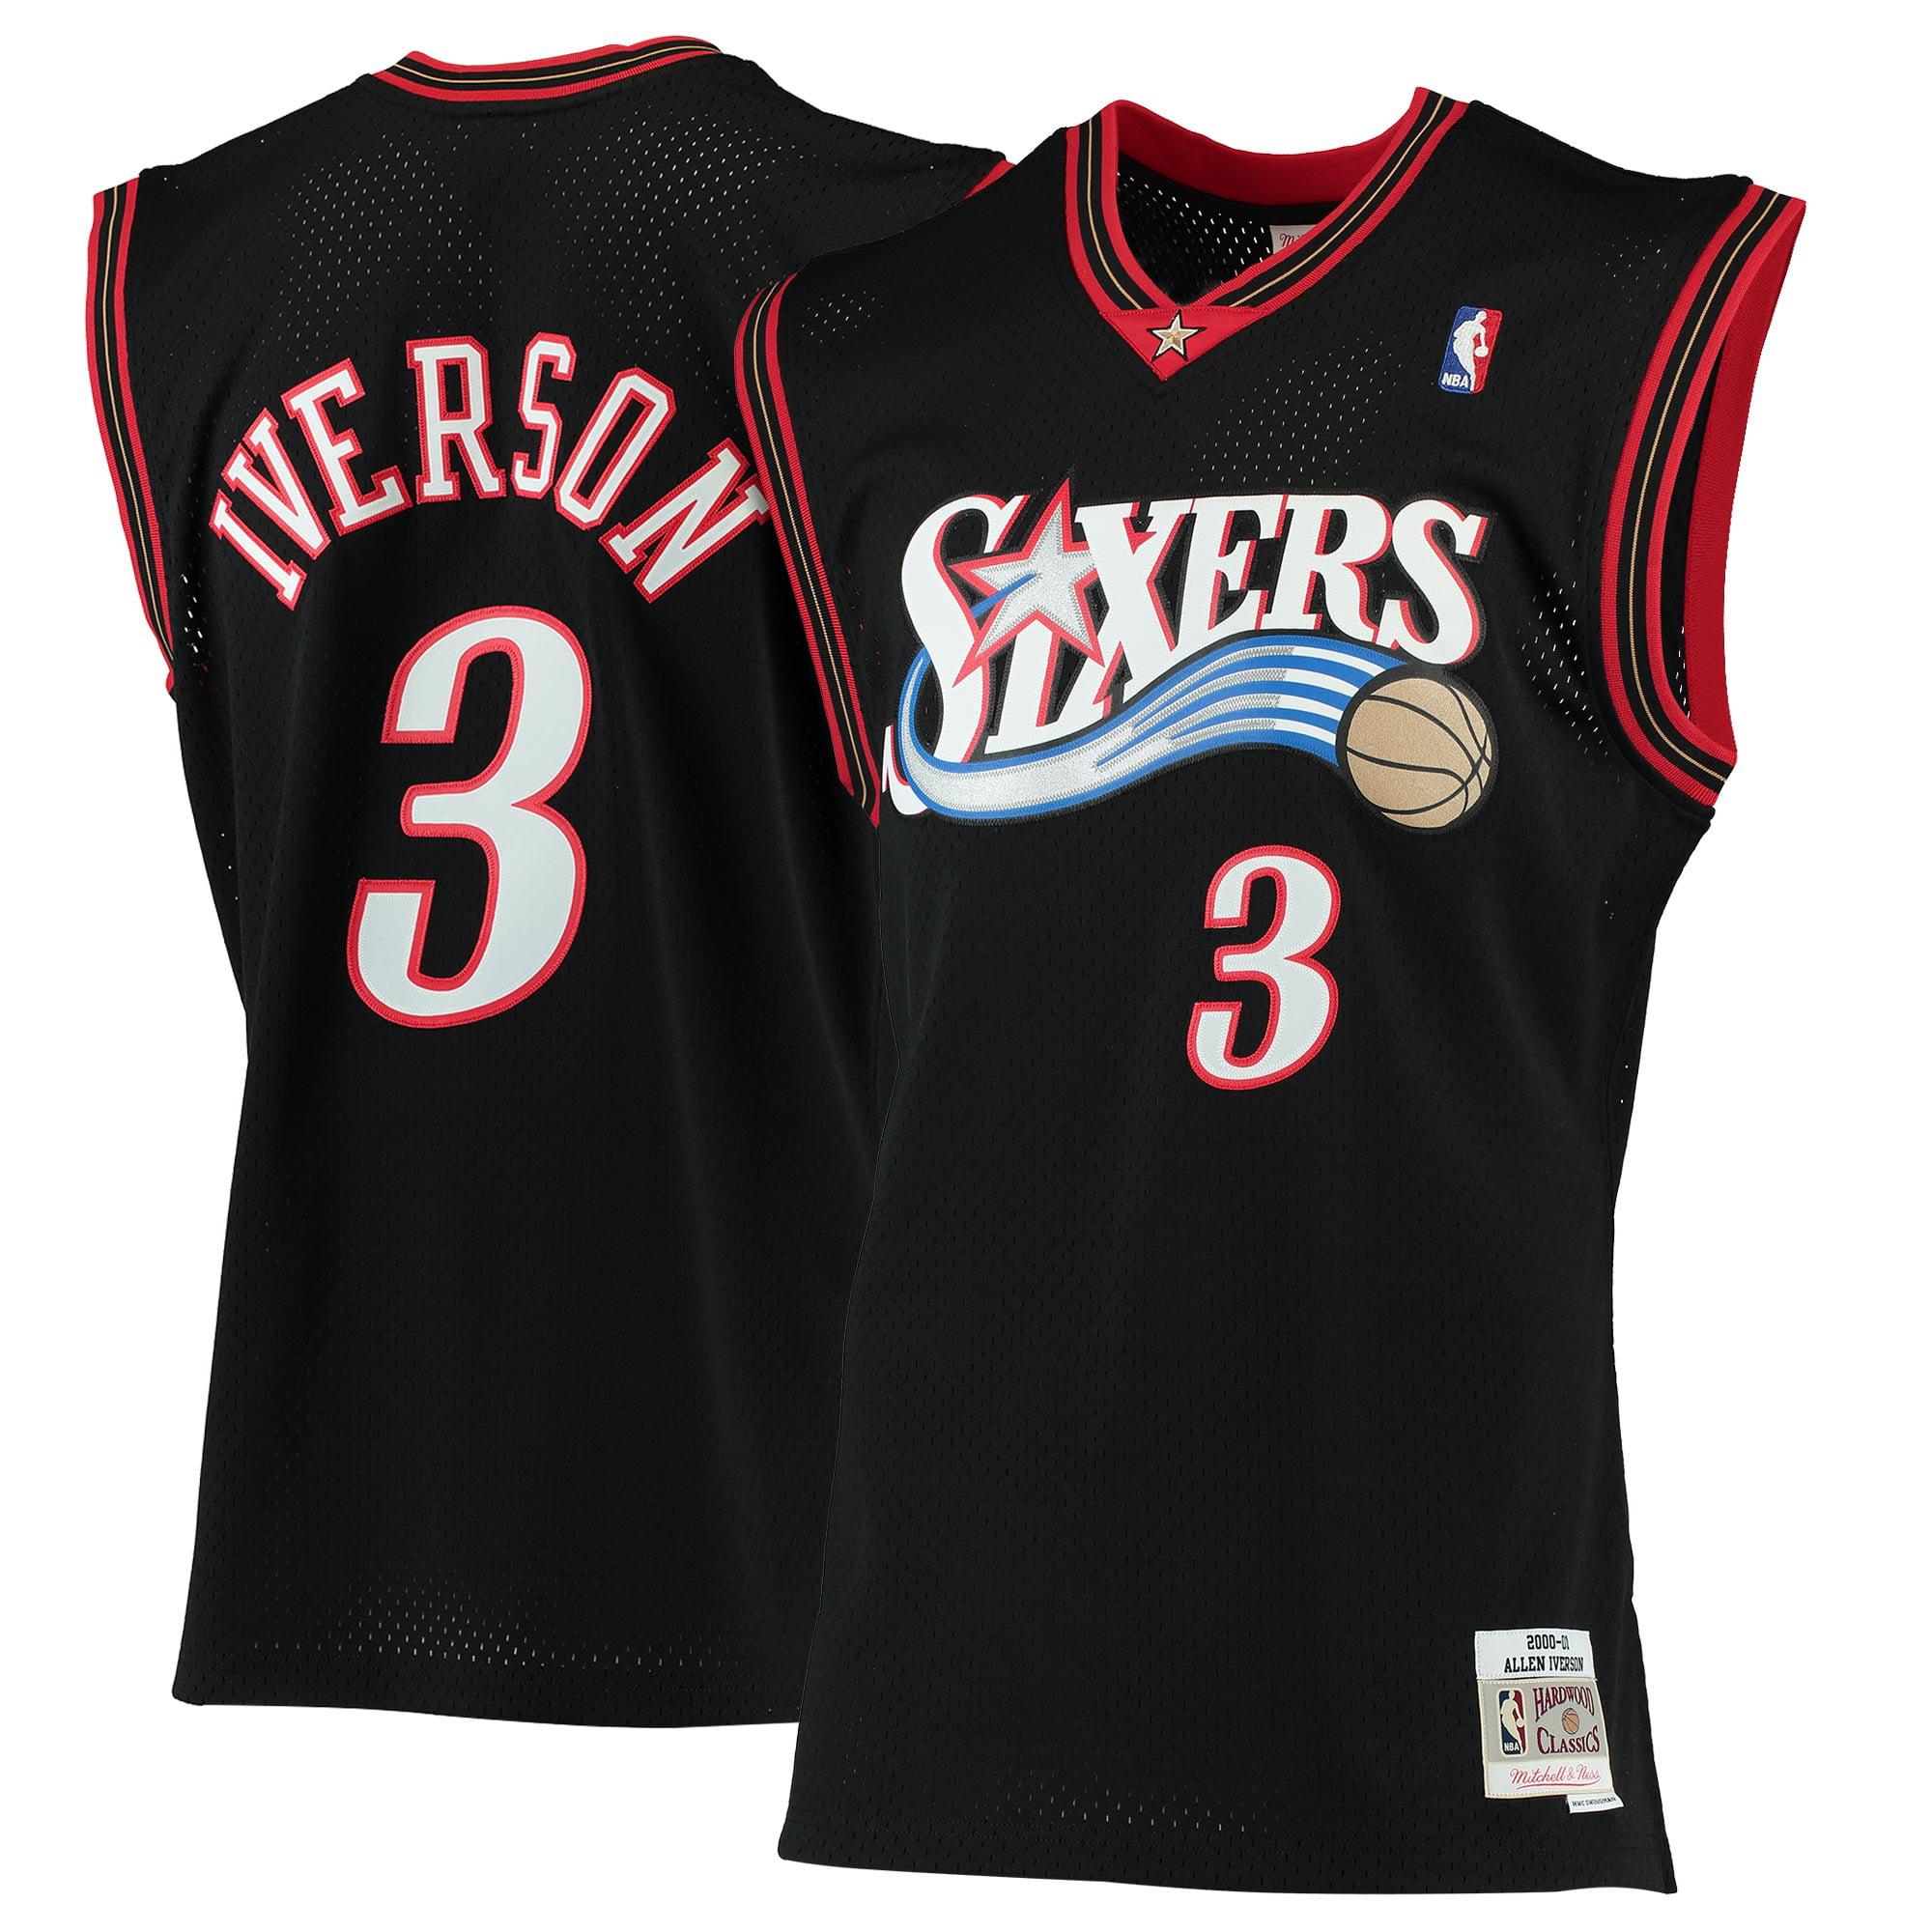 Allen Iverson Philadelphia 76ers Mitchell & Ness 2000-01 Hardwood Classics Swingman Jersey - Black